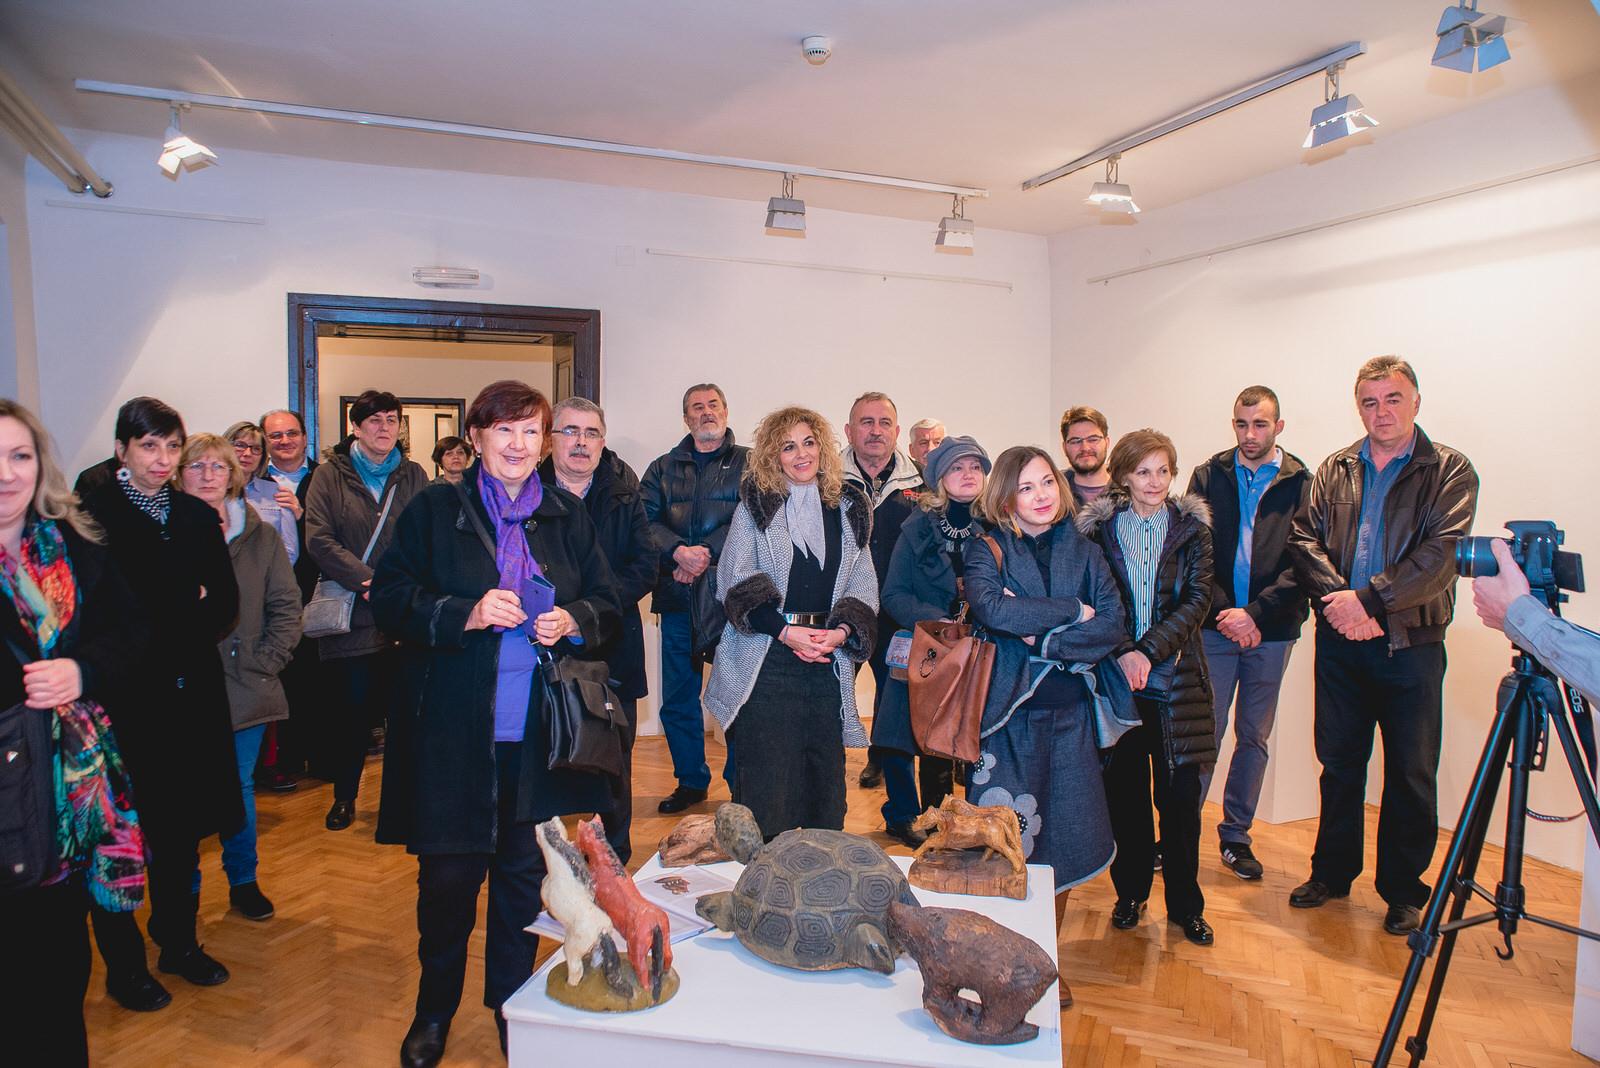 likaclub_gospić_izložba-poetika-skulpture-u-drvu_2019-161